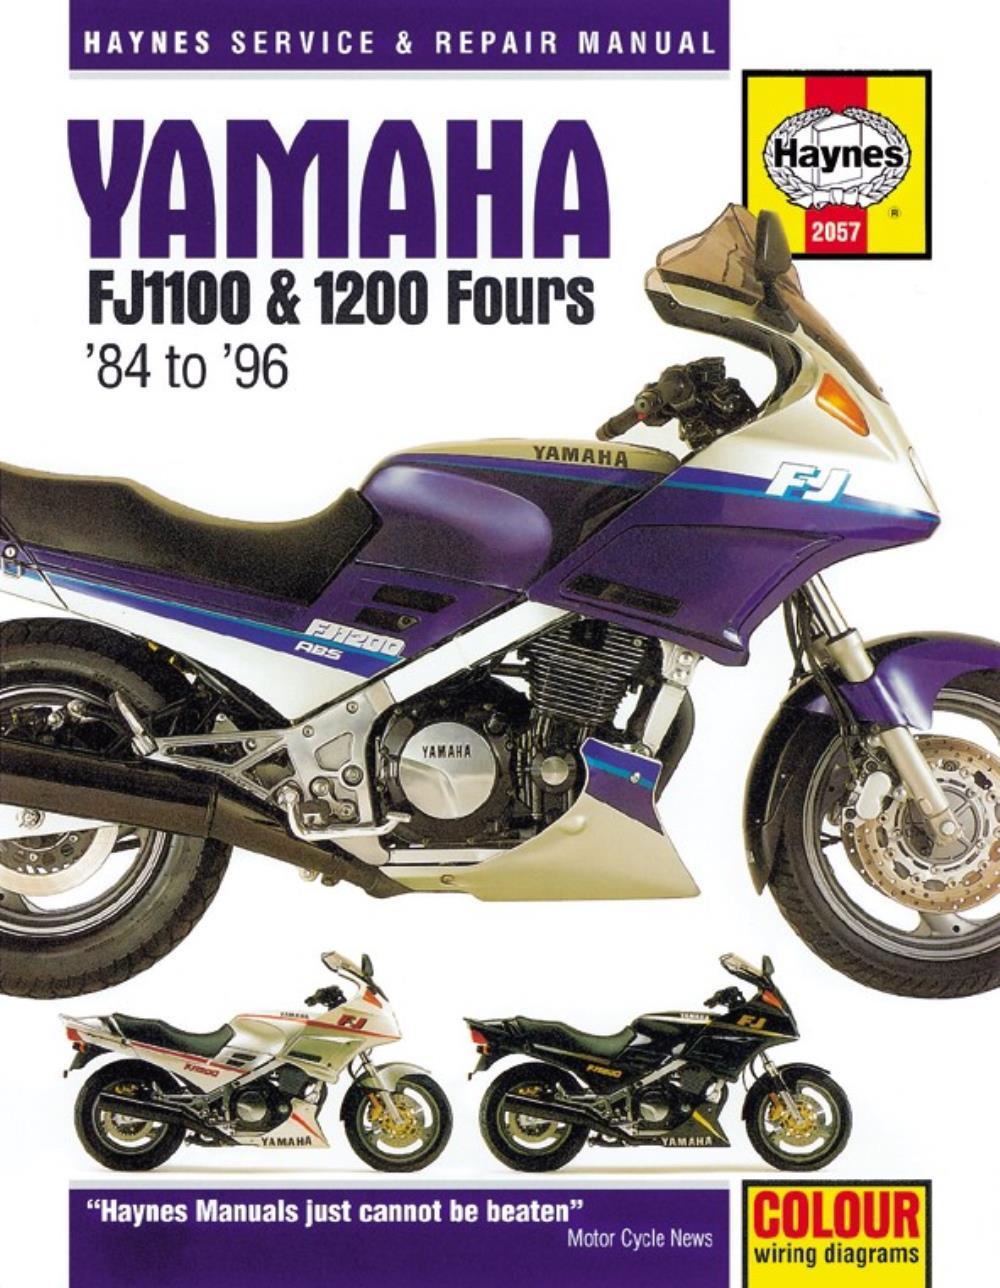 Manual Haynes For 1984 Yamaha Fj 1100 L 36y Ebay Wiring Diagrams Image Is Loading